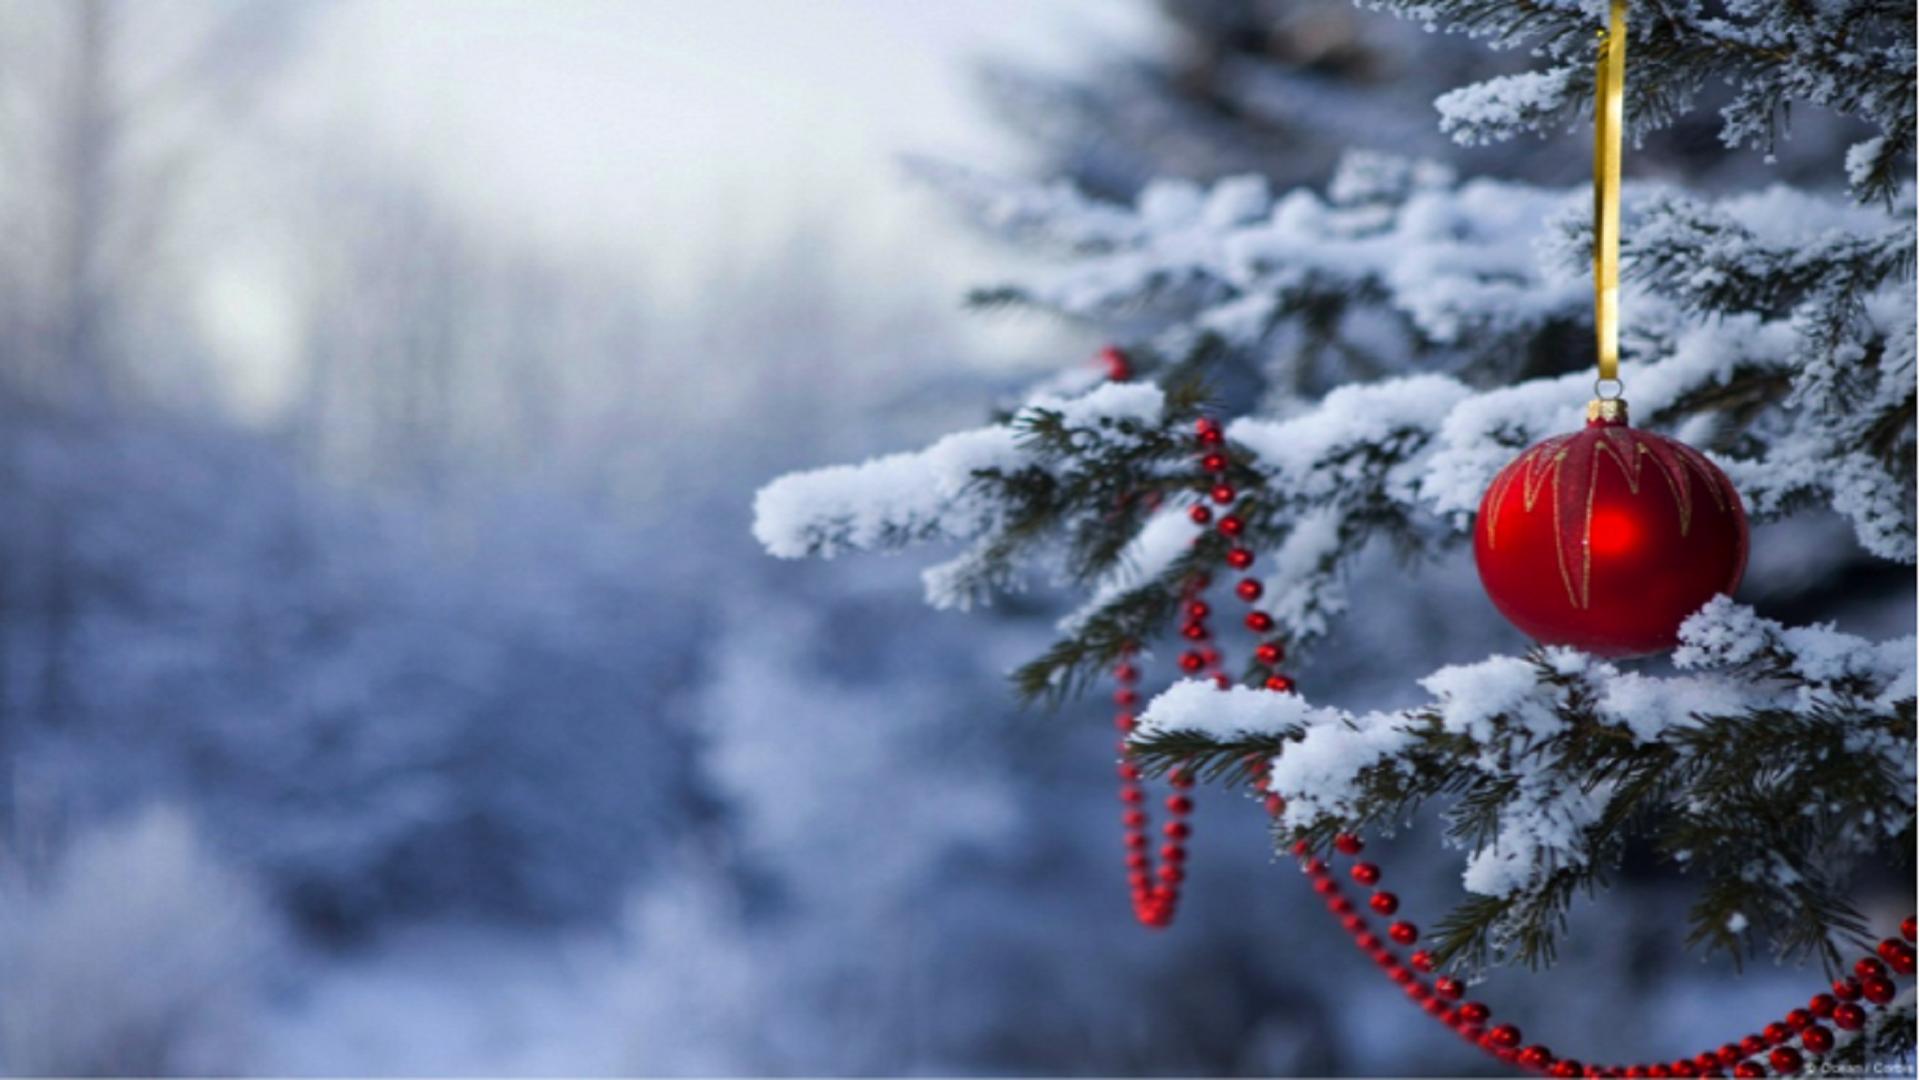 Christmas Wallpapers Hd Free Download , Winter Christmas